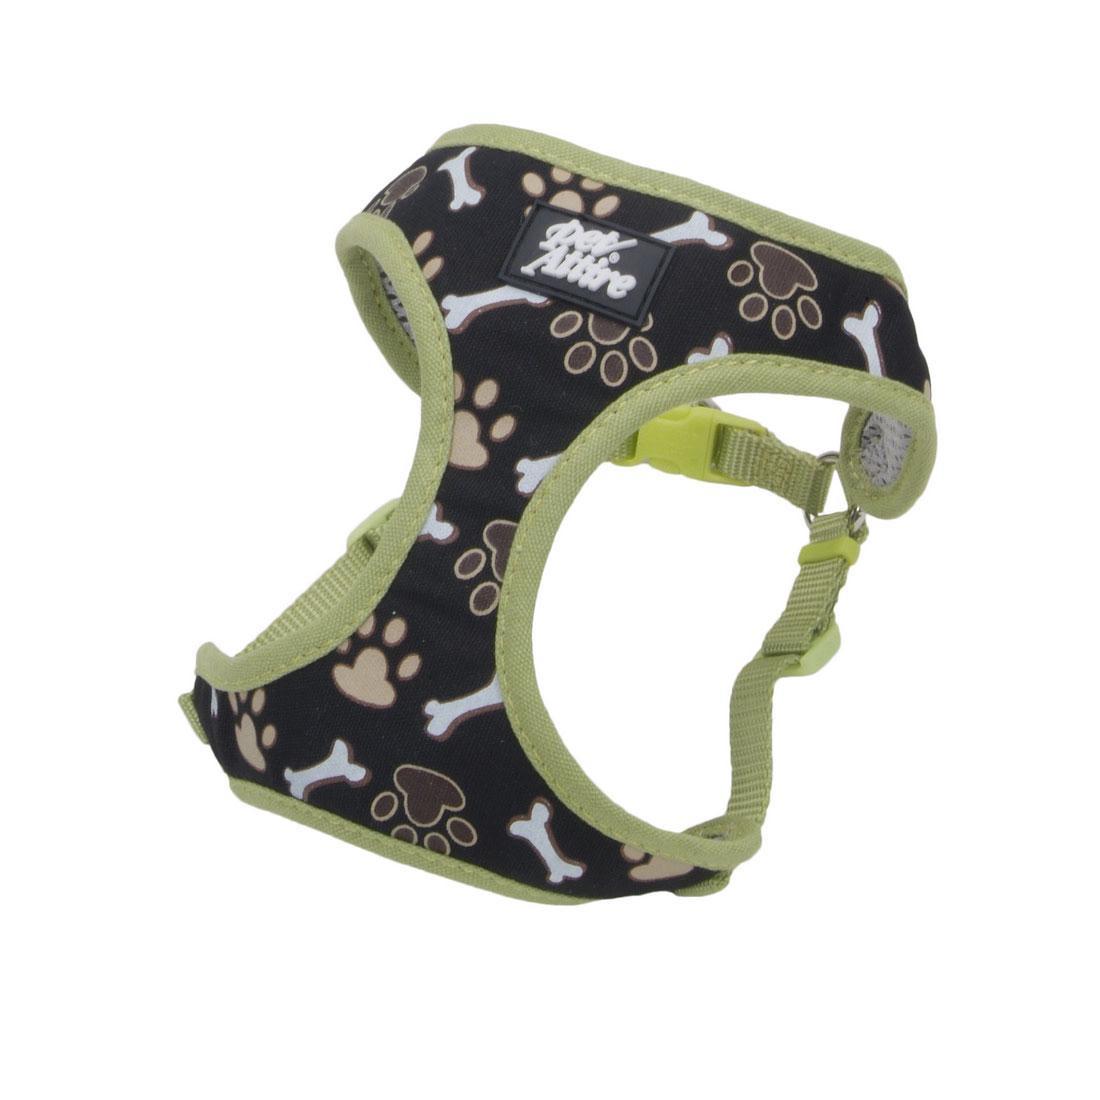 Ribbon Designer Wrap Adjustable Dog Harness, Brown Paws & Bones, 3/8-in x 14-16-in